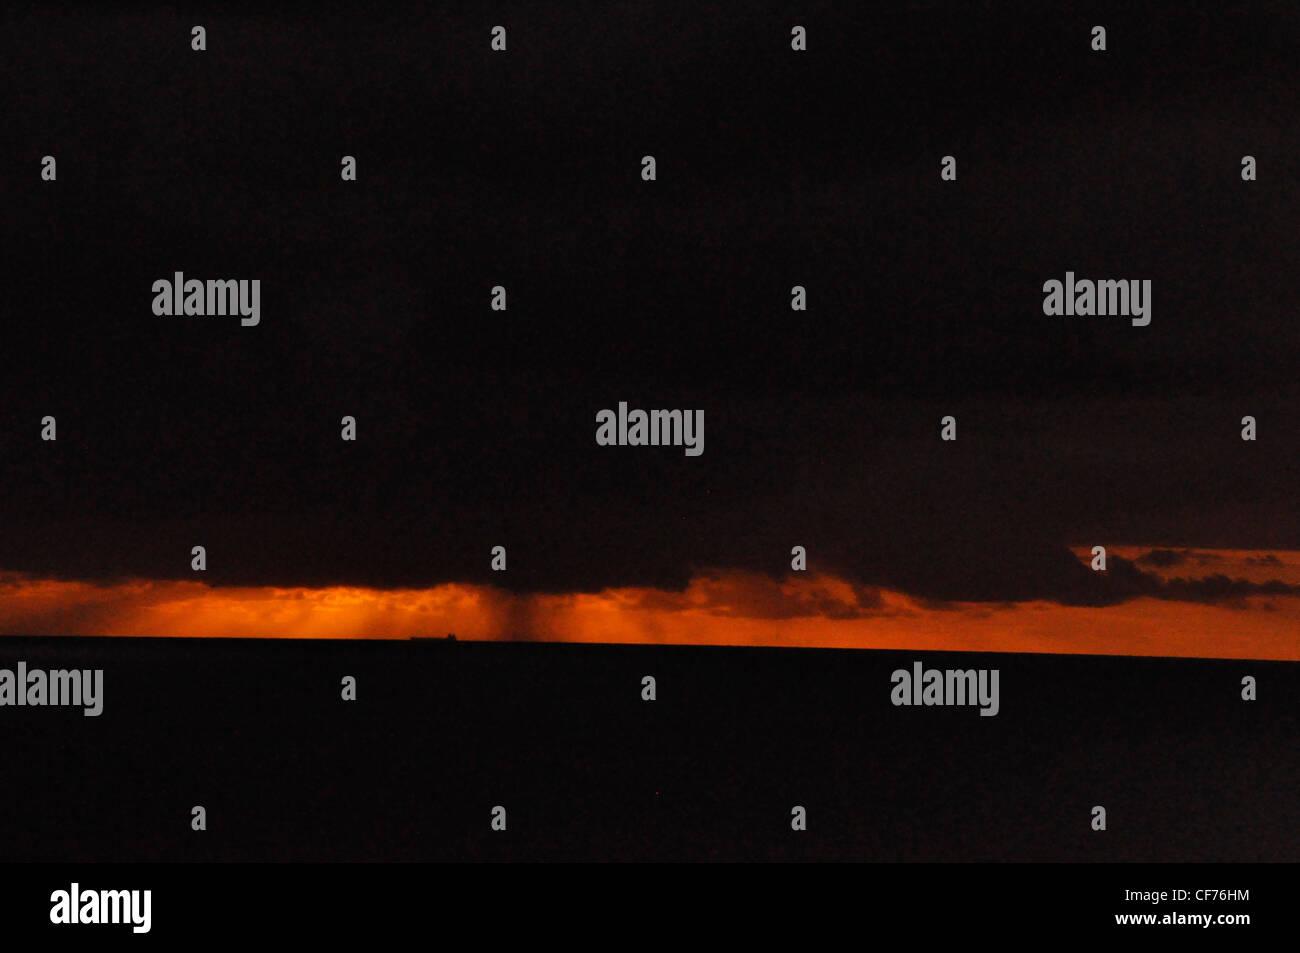 Black Sky & Sea Blazing orange clouds dramatic moody - Stock Image